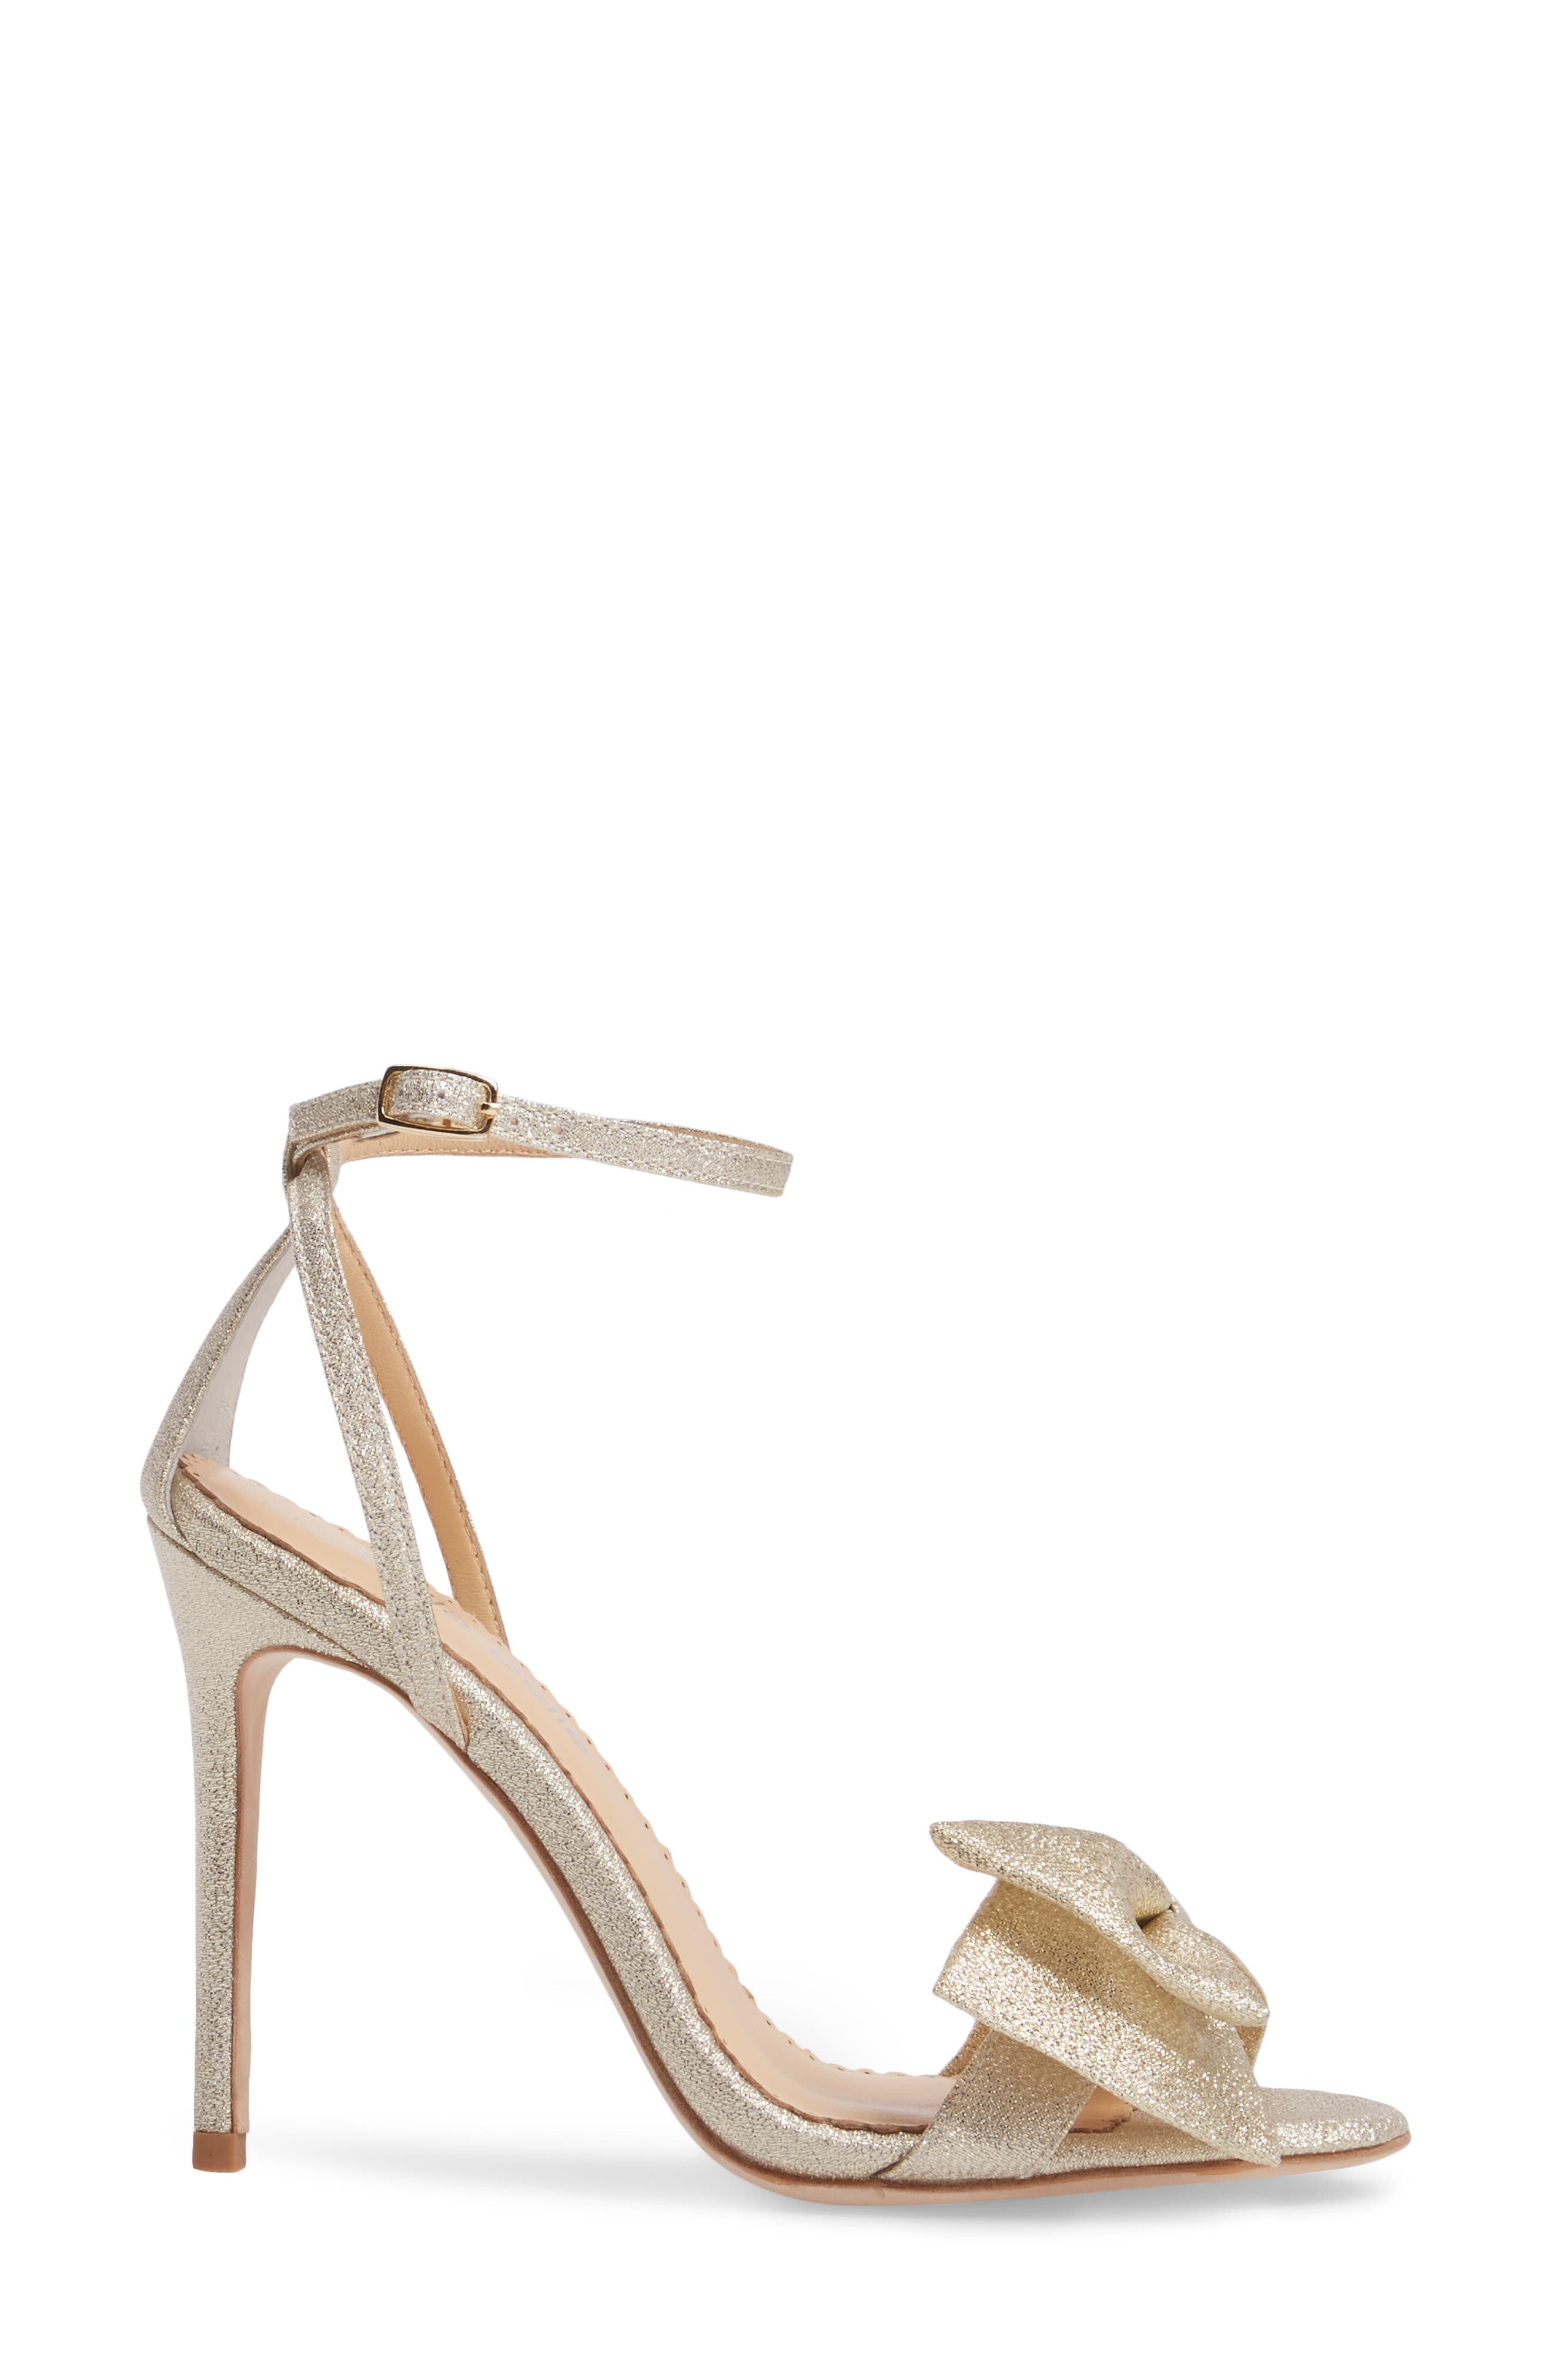 Aubrey Bow Ankle Strap Sandal,                             Alternate thumbnail 3, color,                             Gold